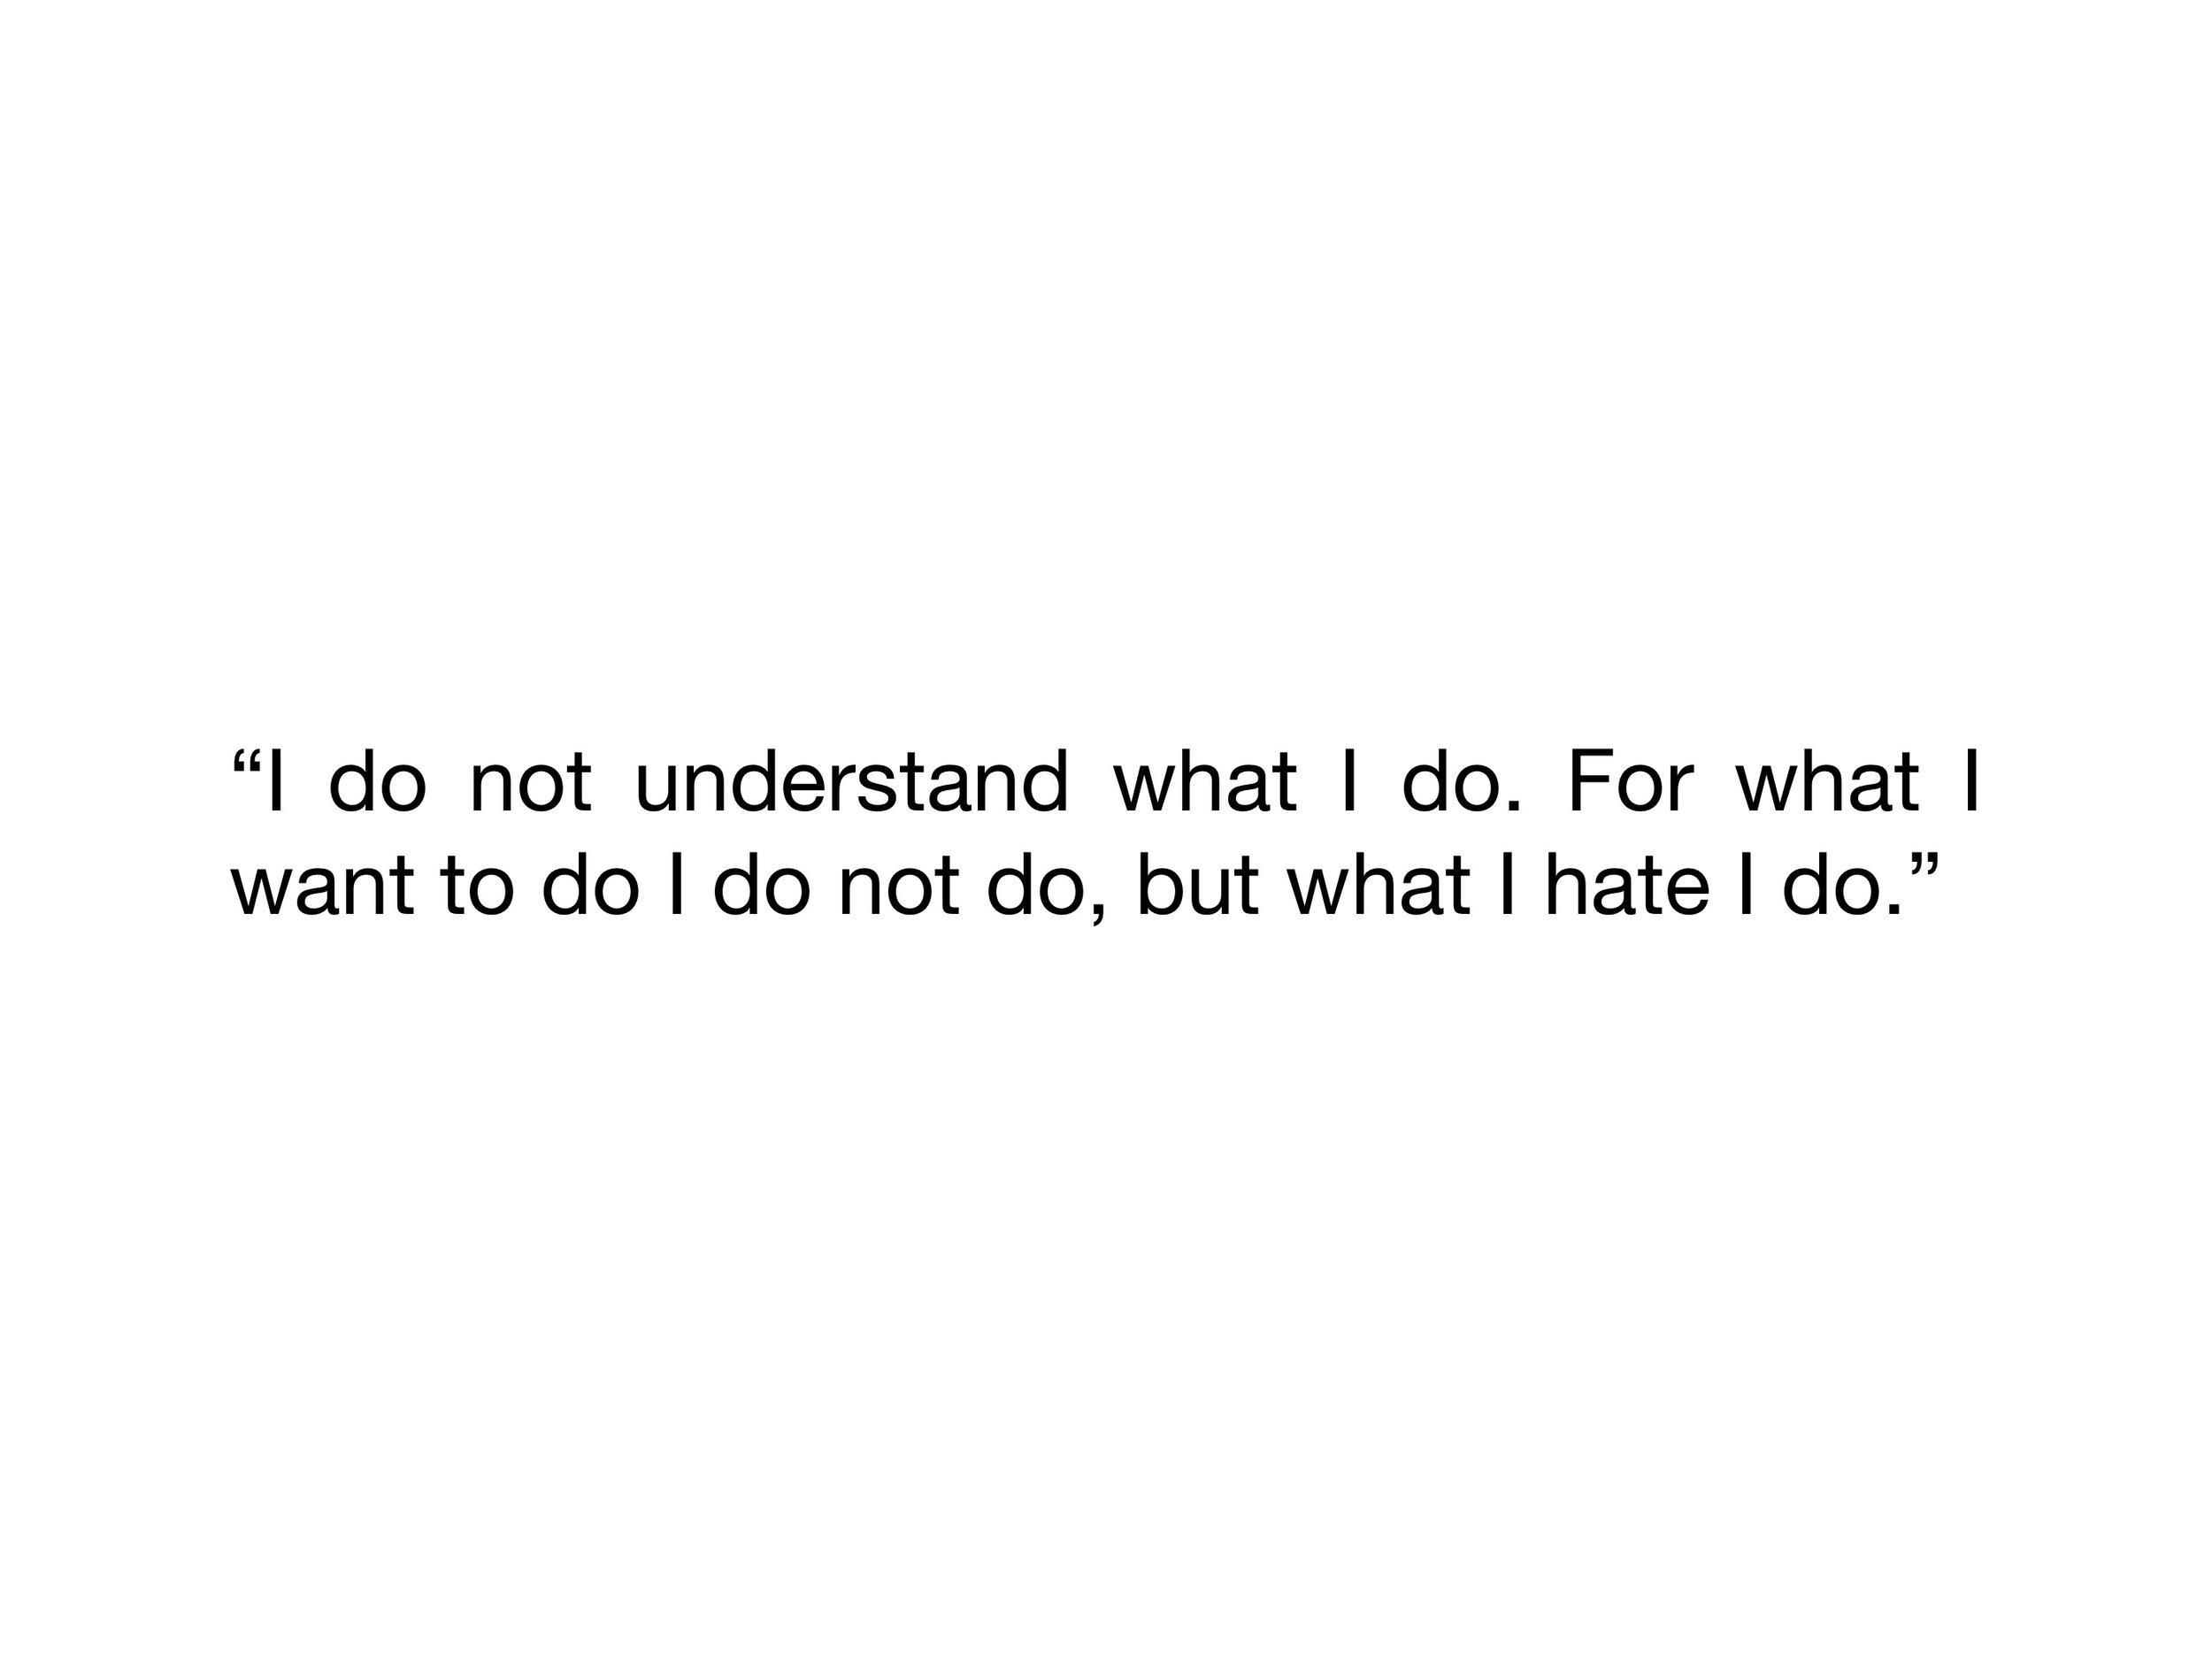 Romans 7:15-25 Sildes-1 24-24.jpeg